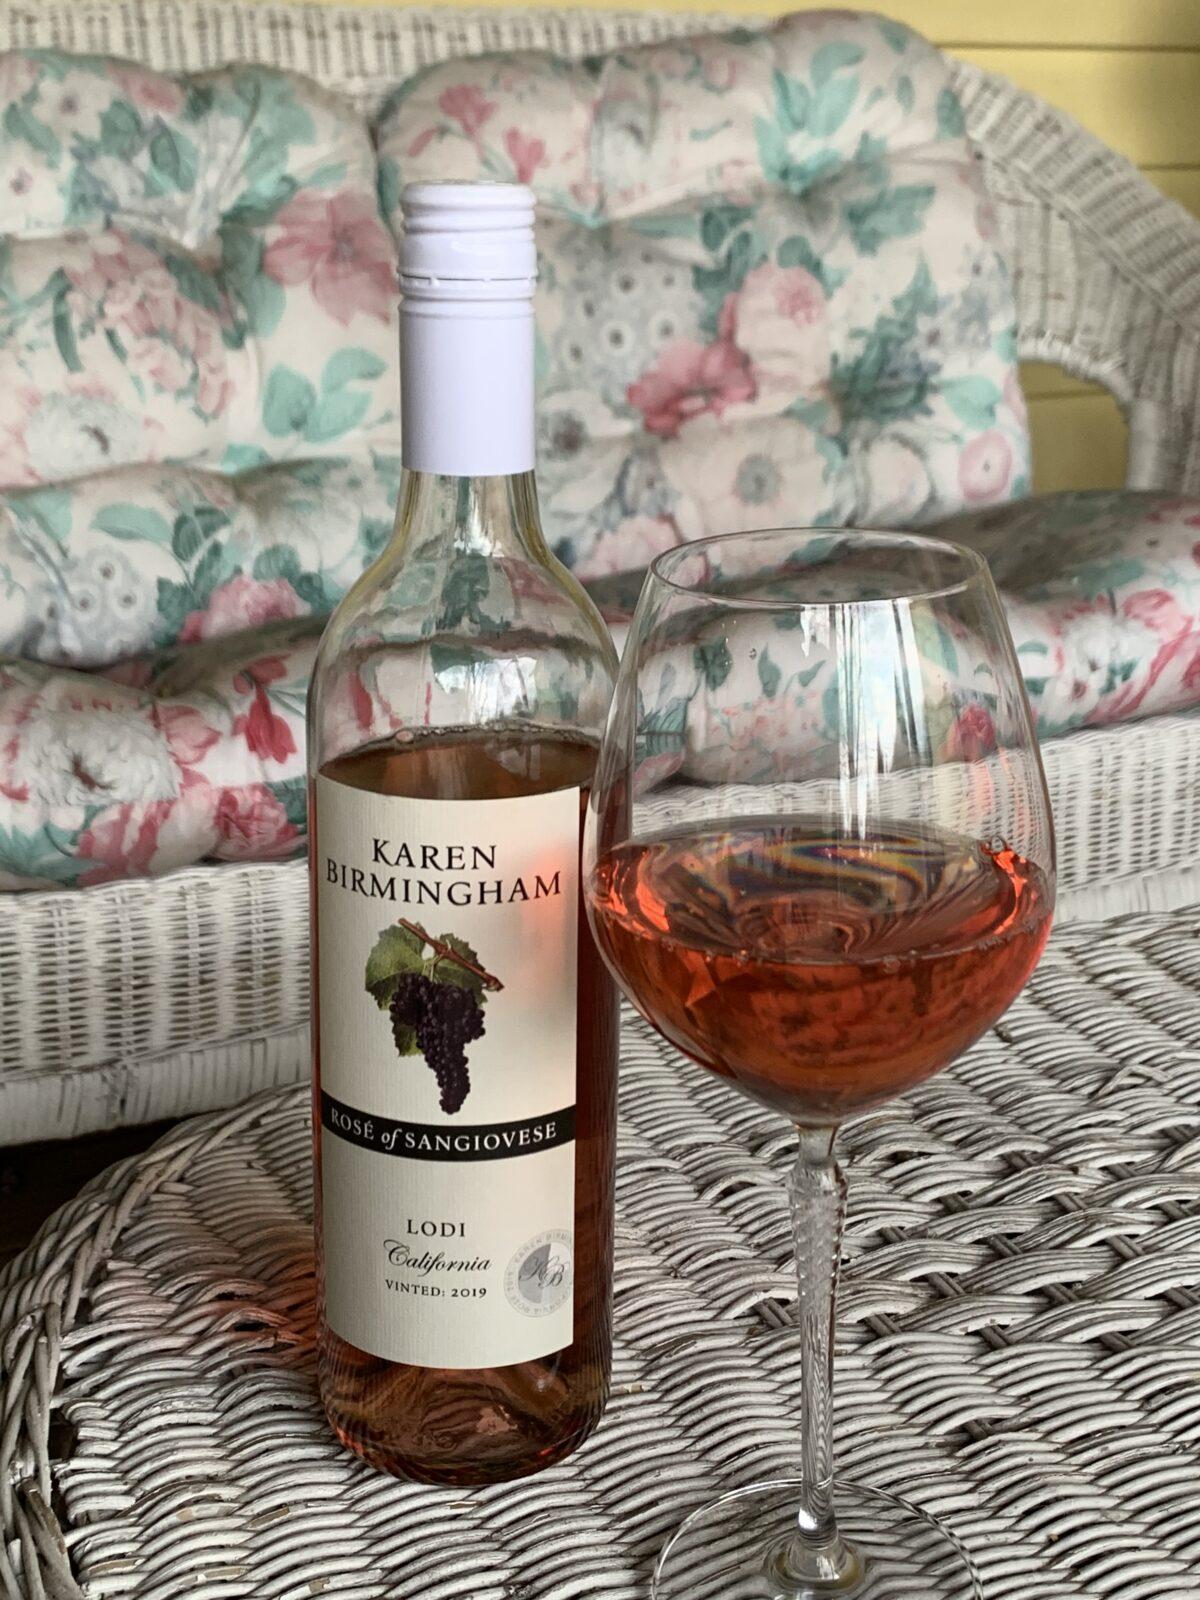 Karen Birmingham Rose of Sangiovese Wine Review